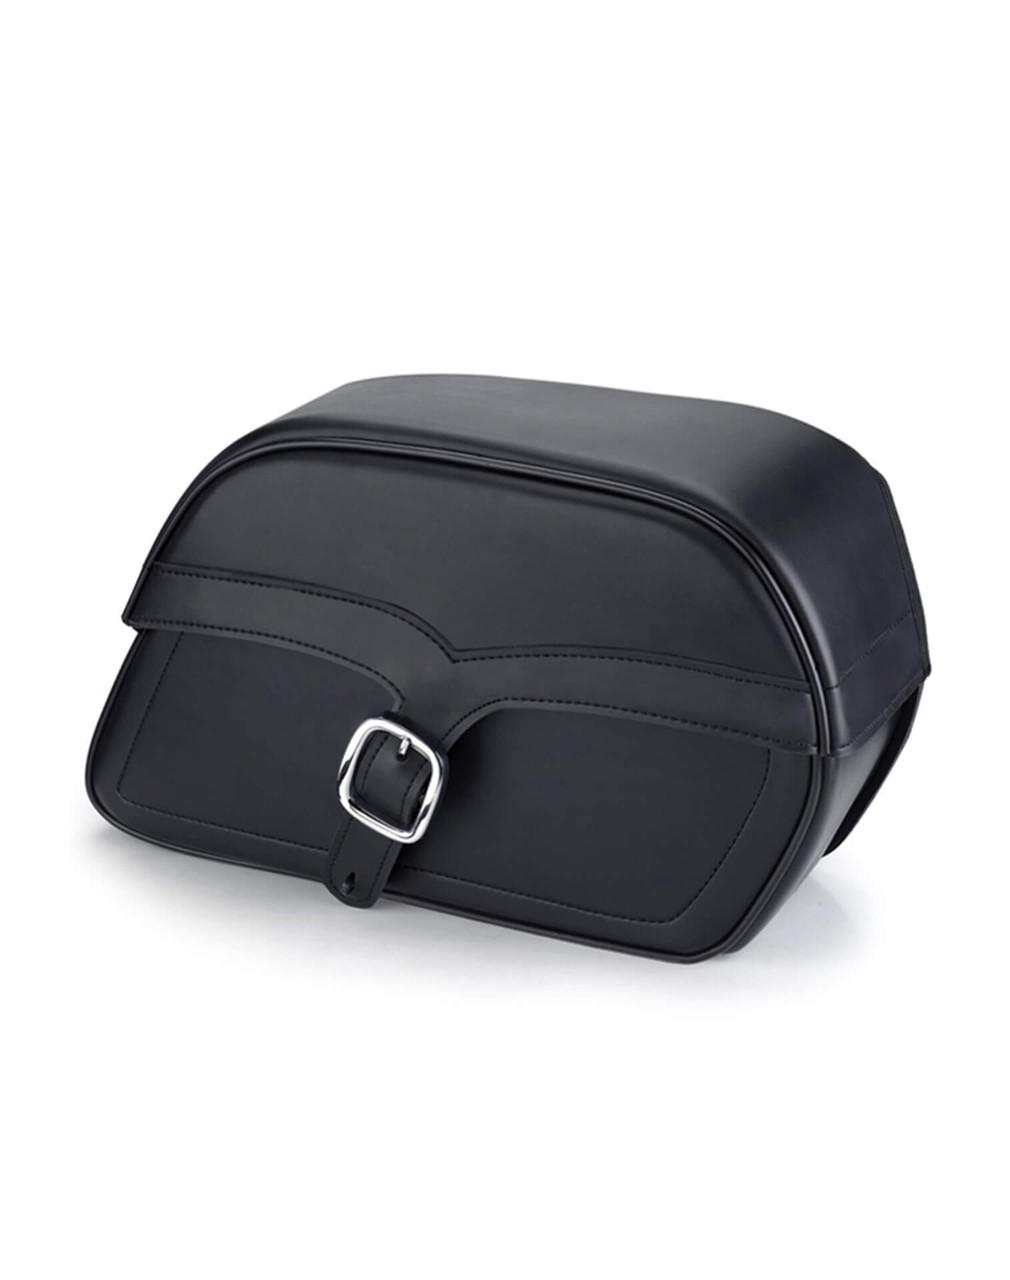 Honda VTX 1300 C Medium SS Slanted Motorcycle Saddlebags Main Bag View